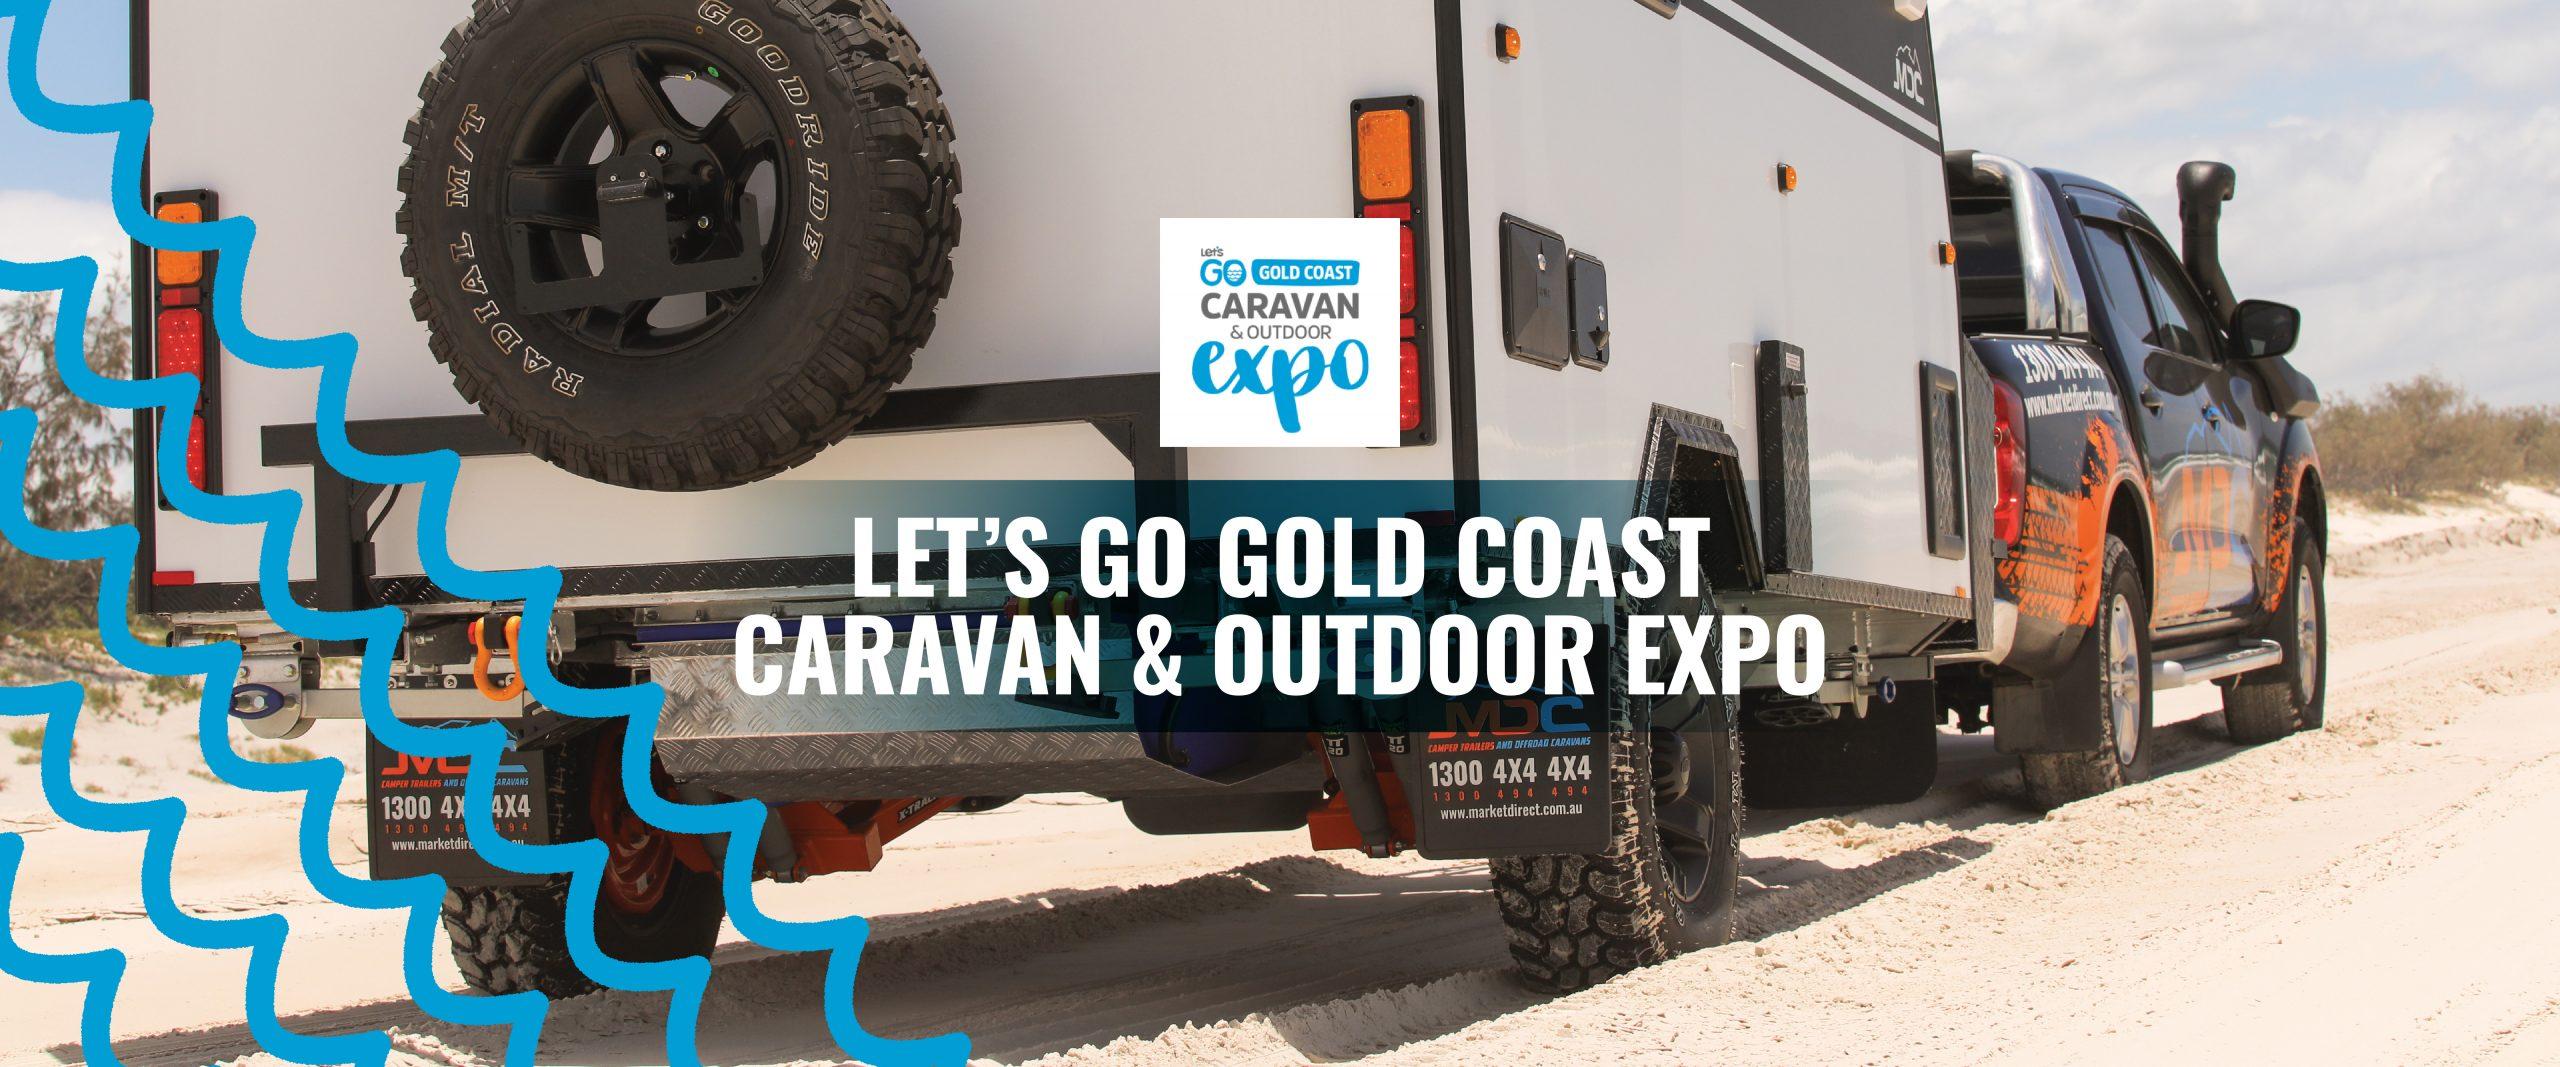 Event Feature Let's Go Gold Coast Caravan & camping expo